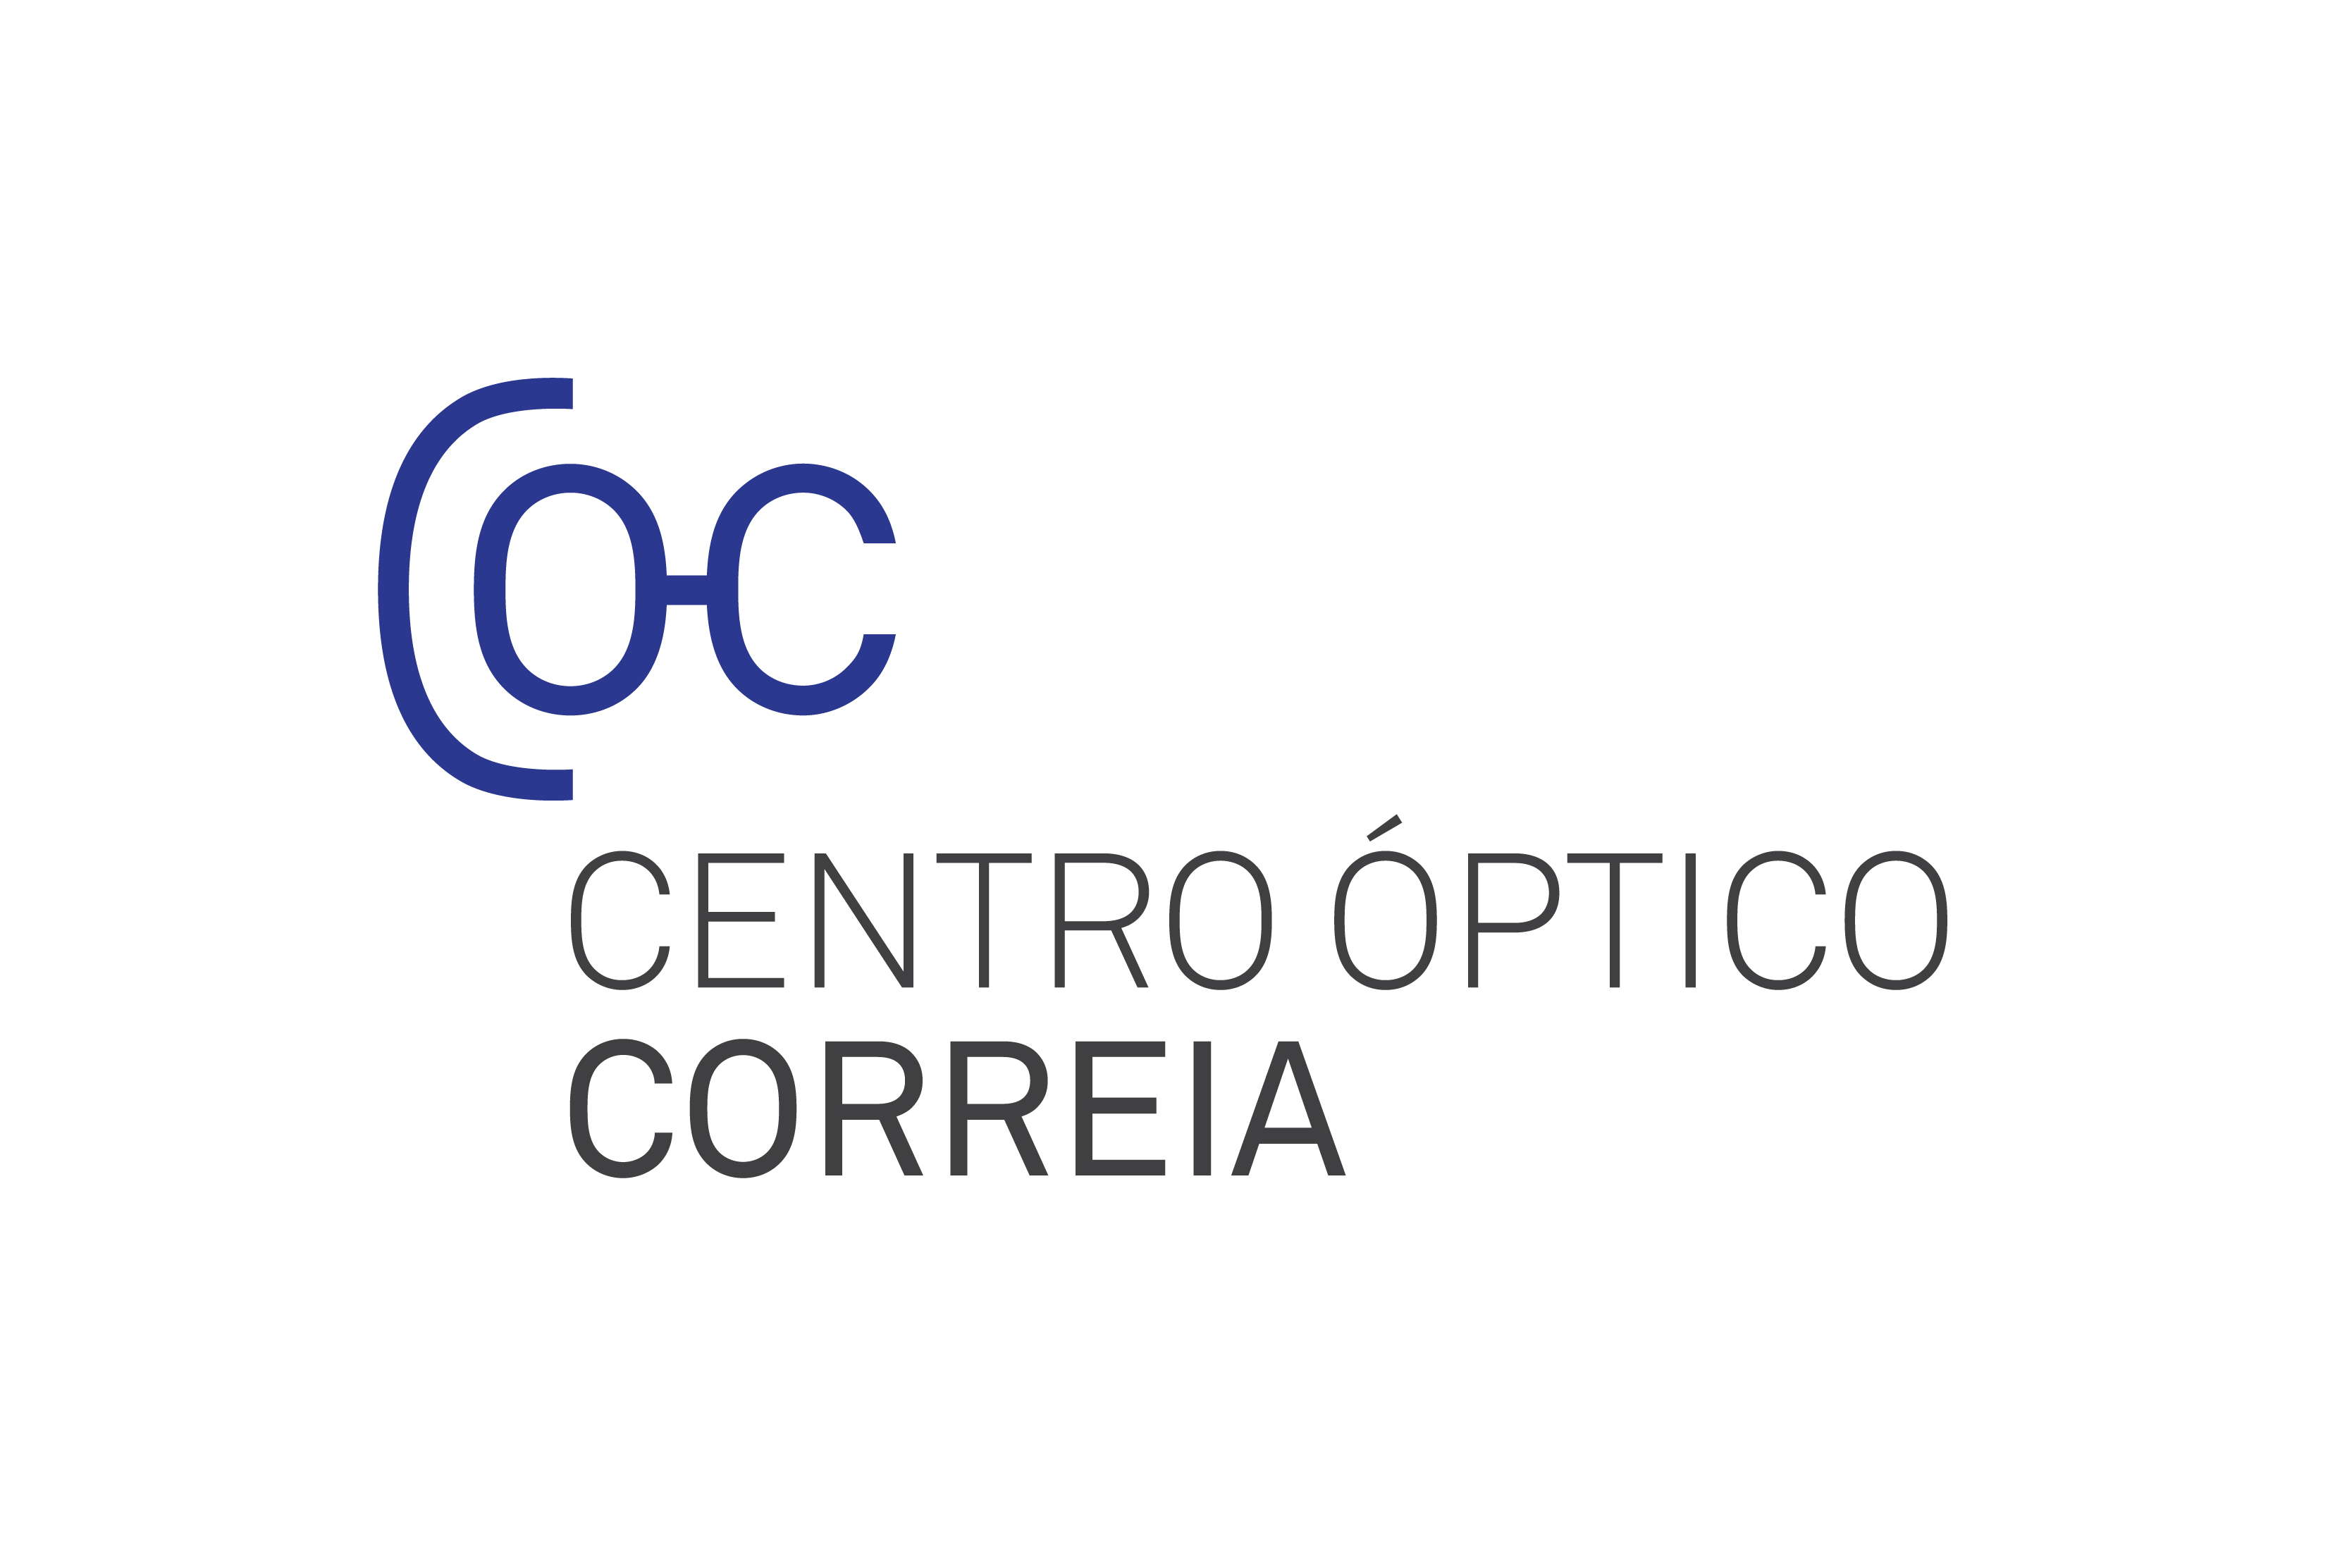 COC - Centro de Optica Correia